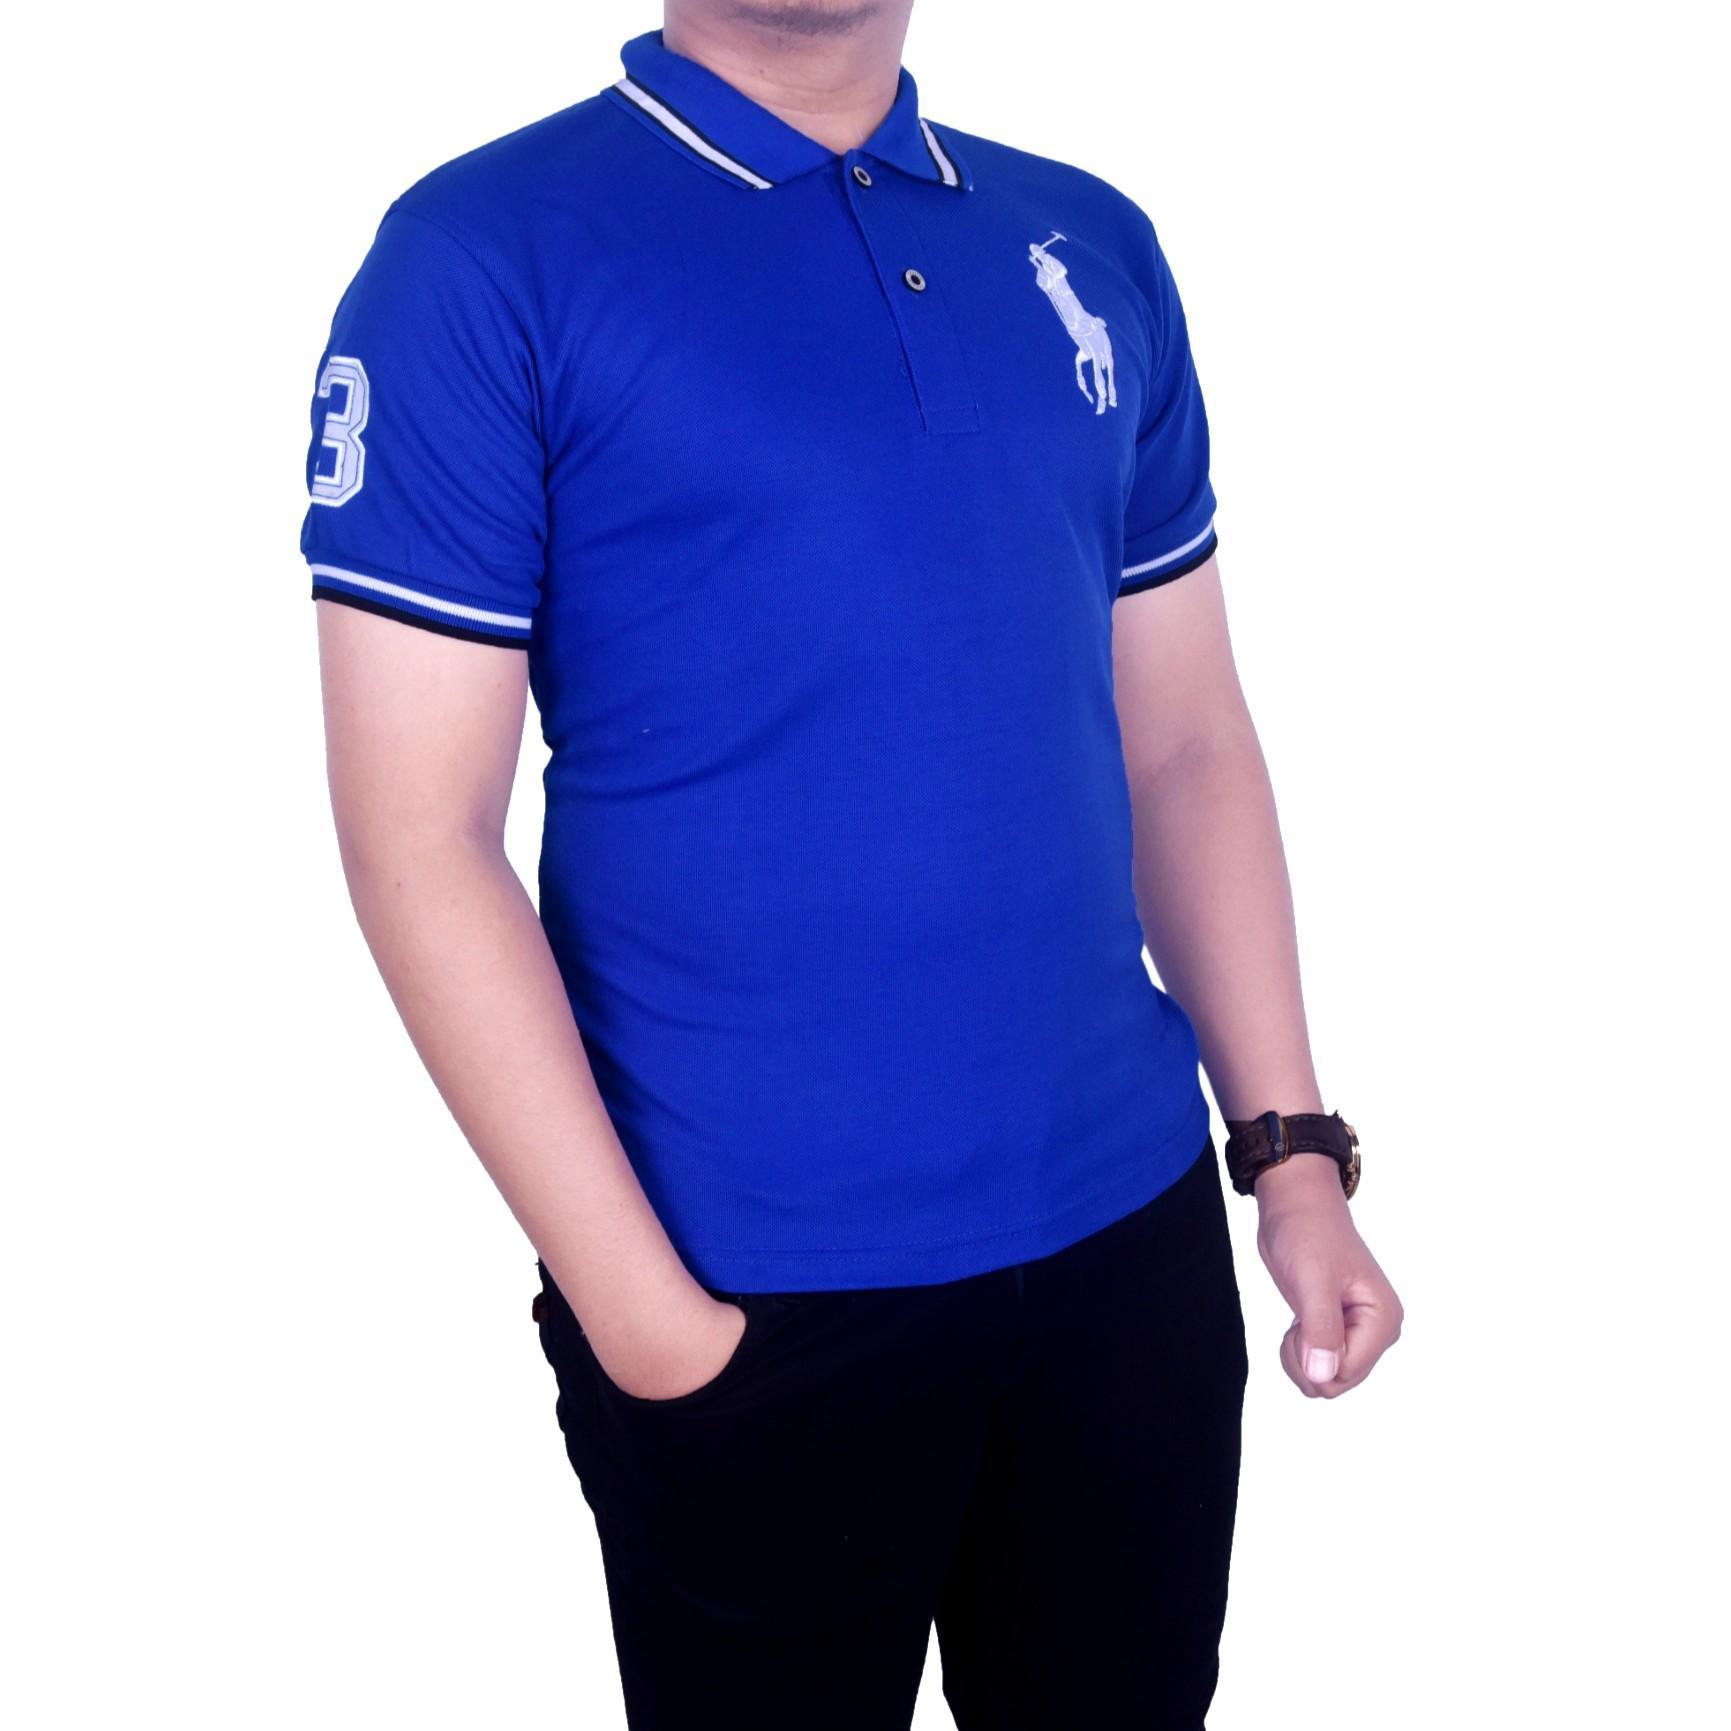 Atasan Dgm Fashion1 Daftar Harga Desember 2018 Fantasia T Shirt Pria Second Flash Hitam Polo Polos Biru Murah Kaos Combinasi